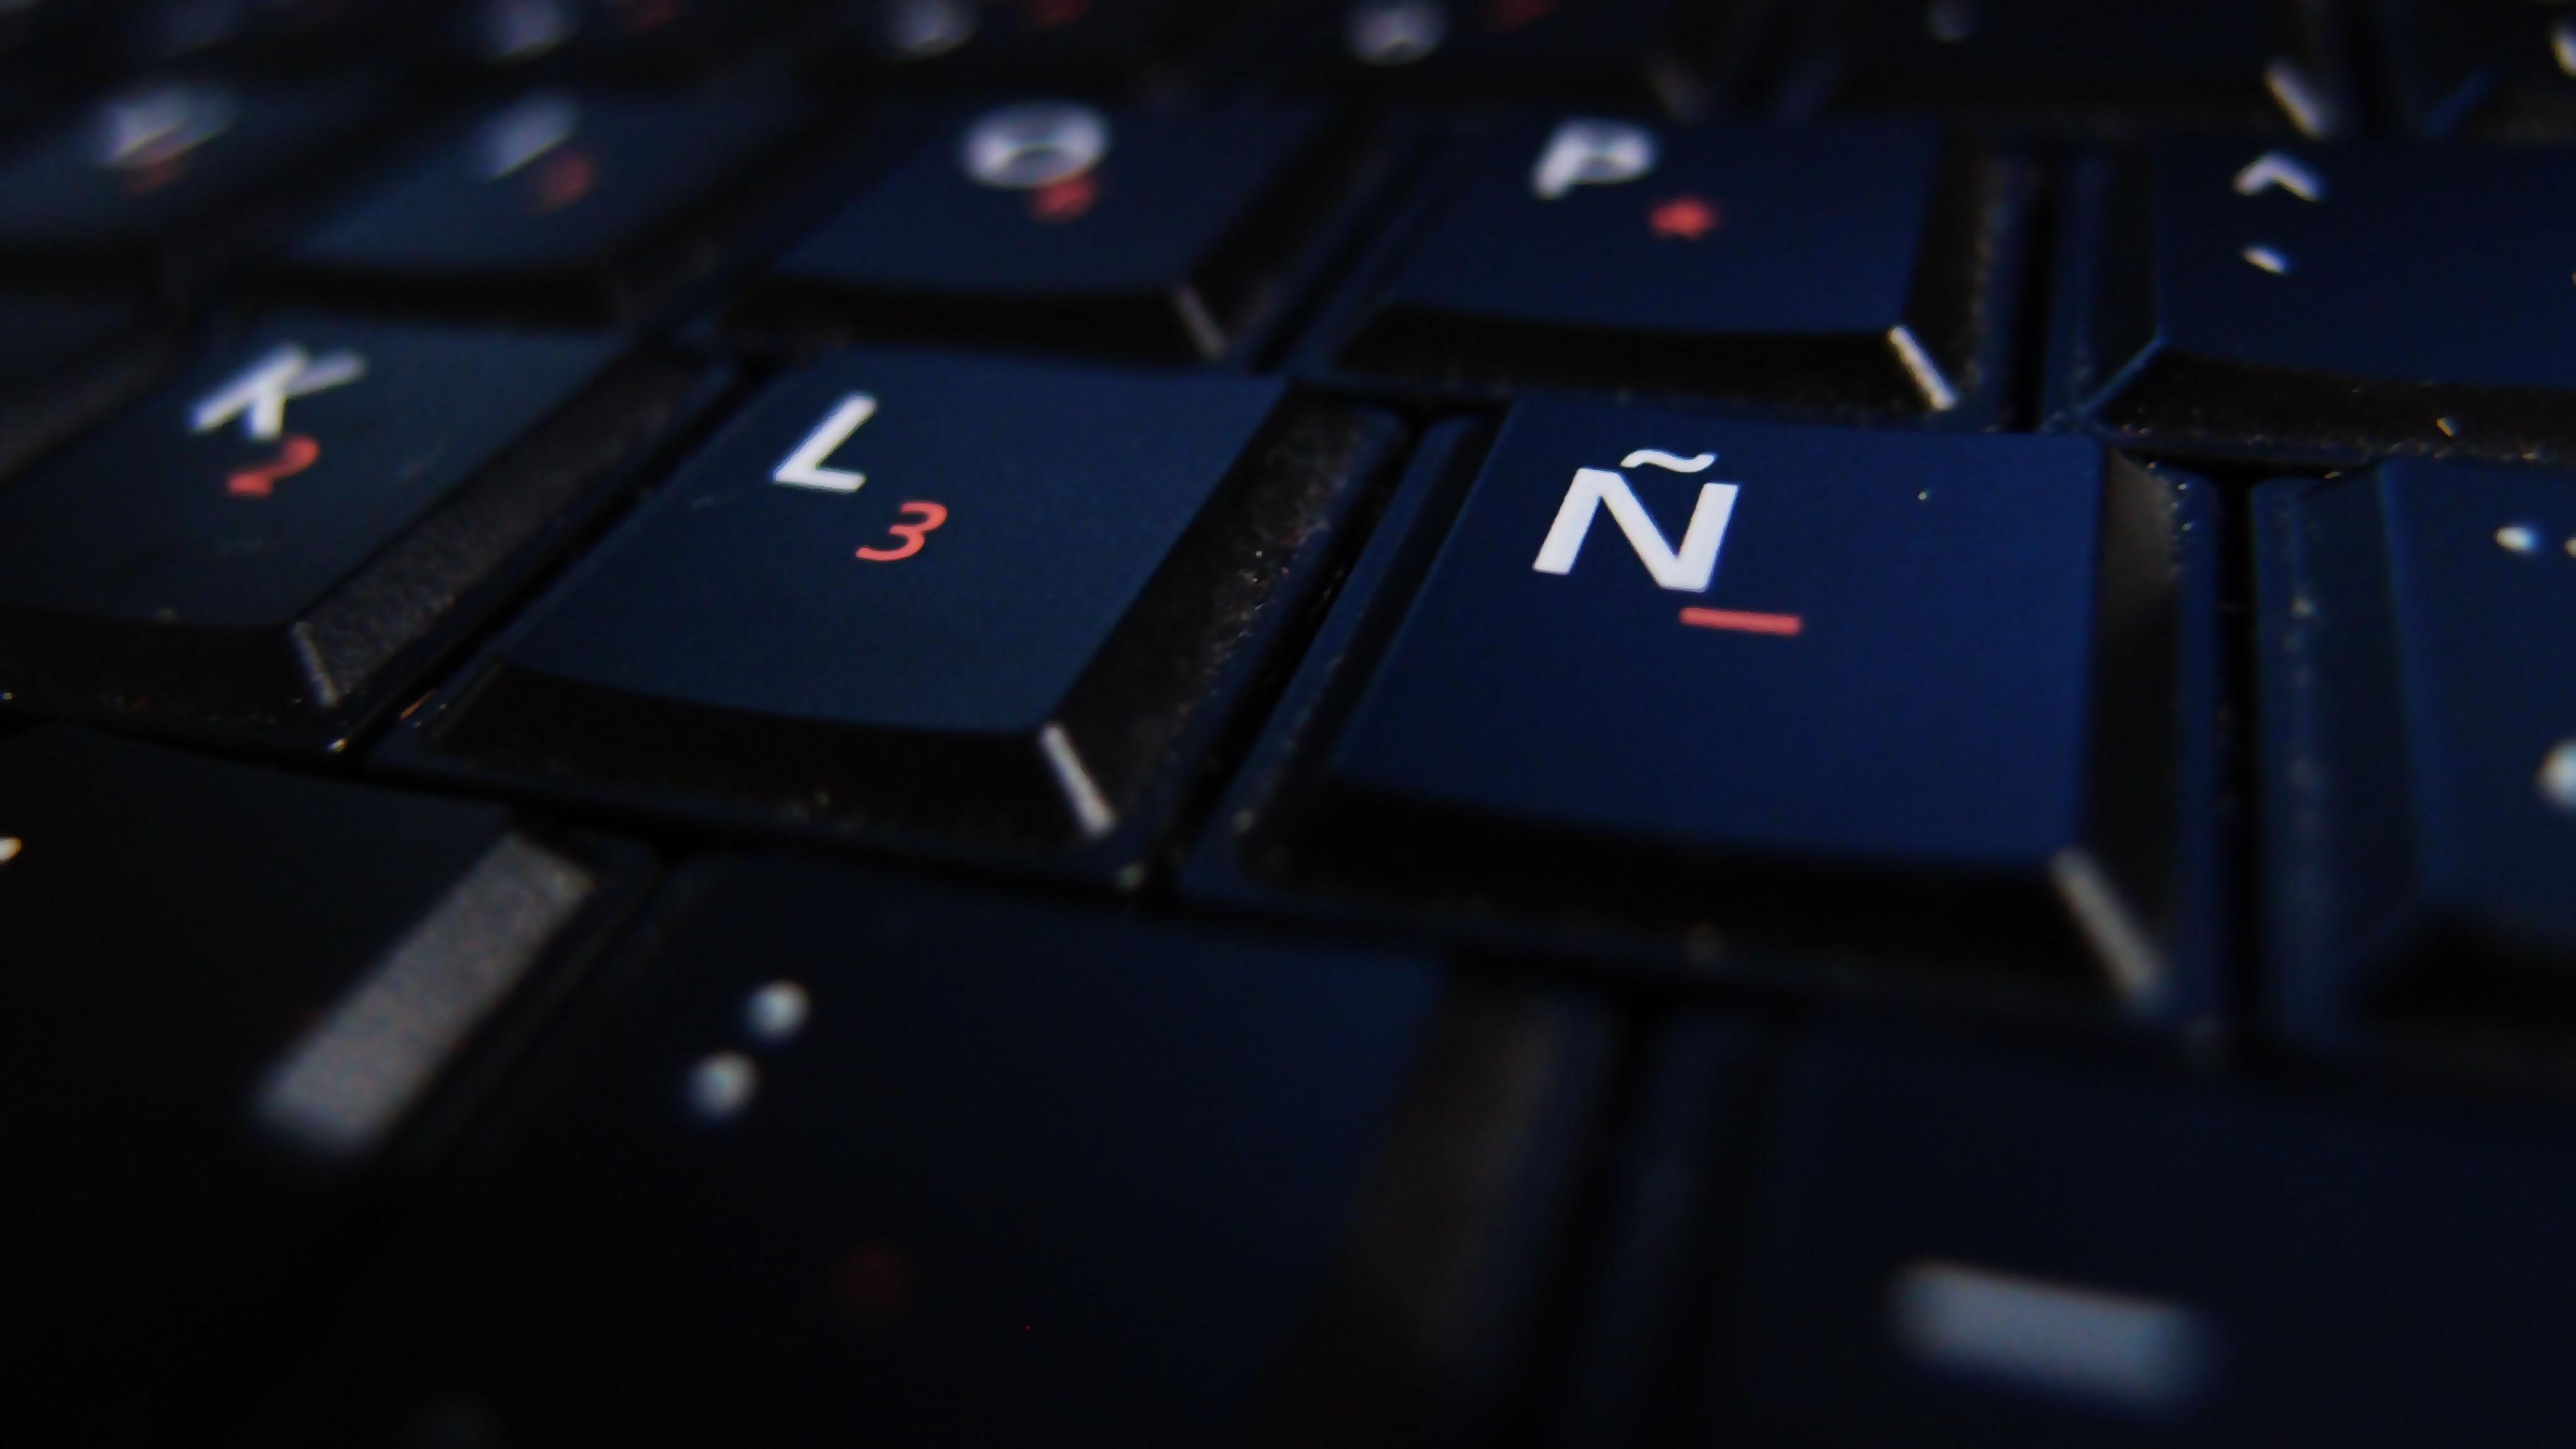 Poner Arroba En Laptop Lenovo - Best Picture Of Lenovo ... - photo#13